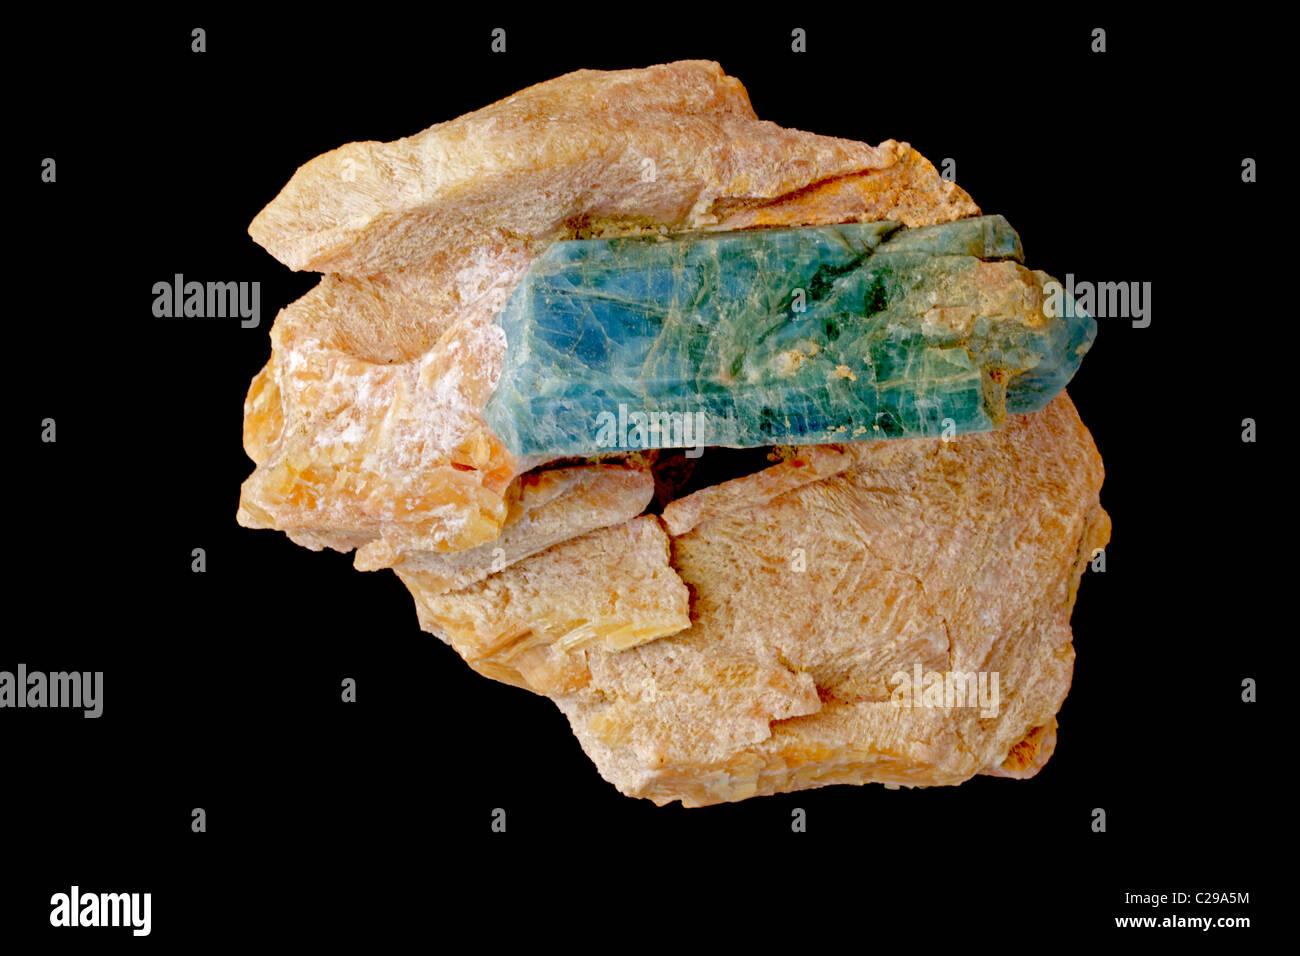 Apatite (Fluorapatite) - Ca5(PO4)3F - Slyudyanka - Baikal region - Siberia - Russia - Used producing phosphate fertilizers - Stock Image